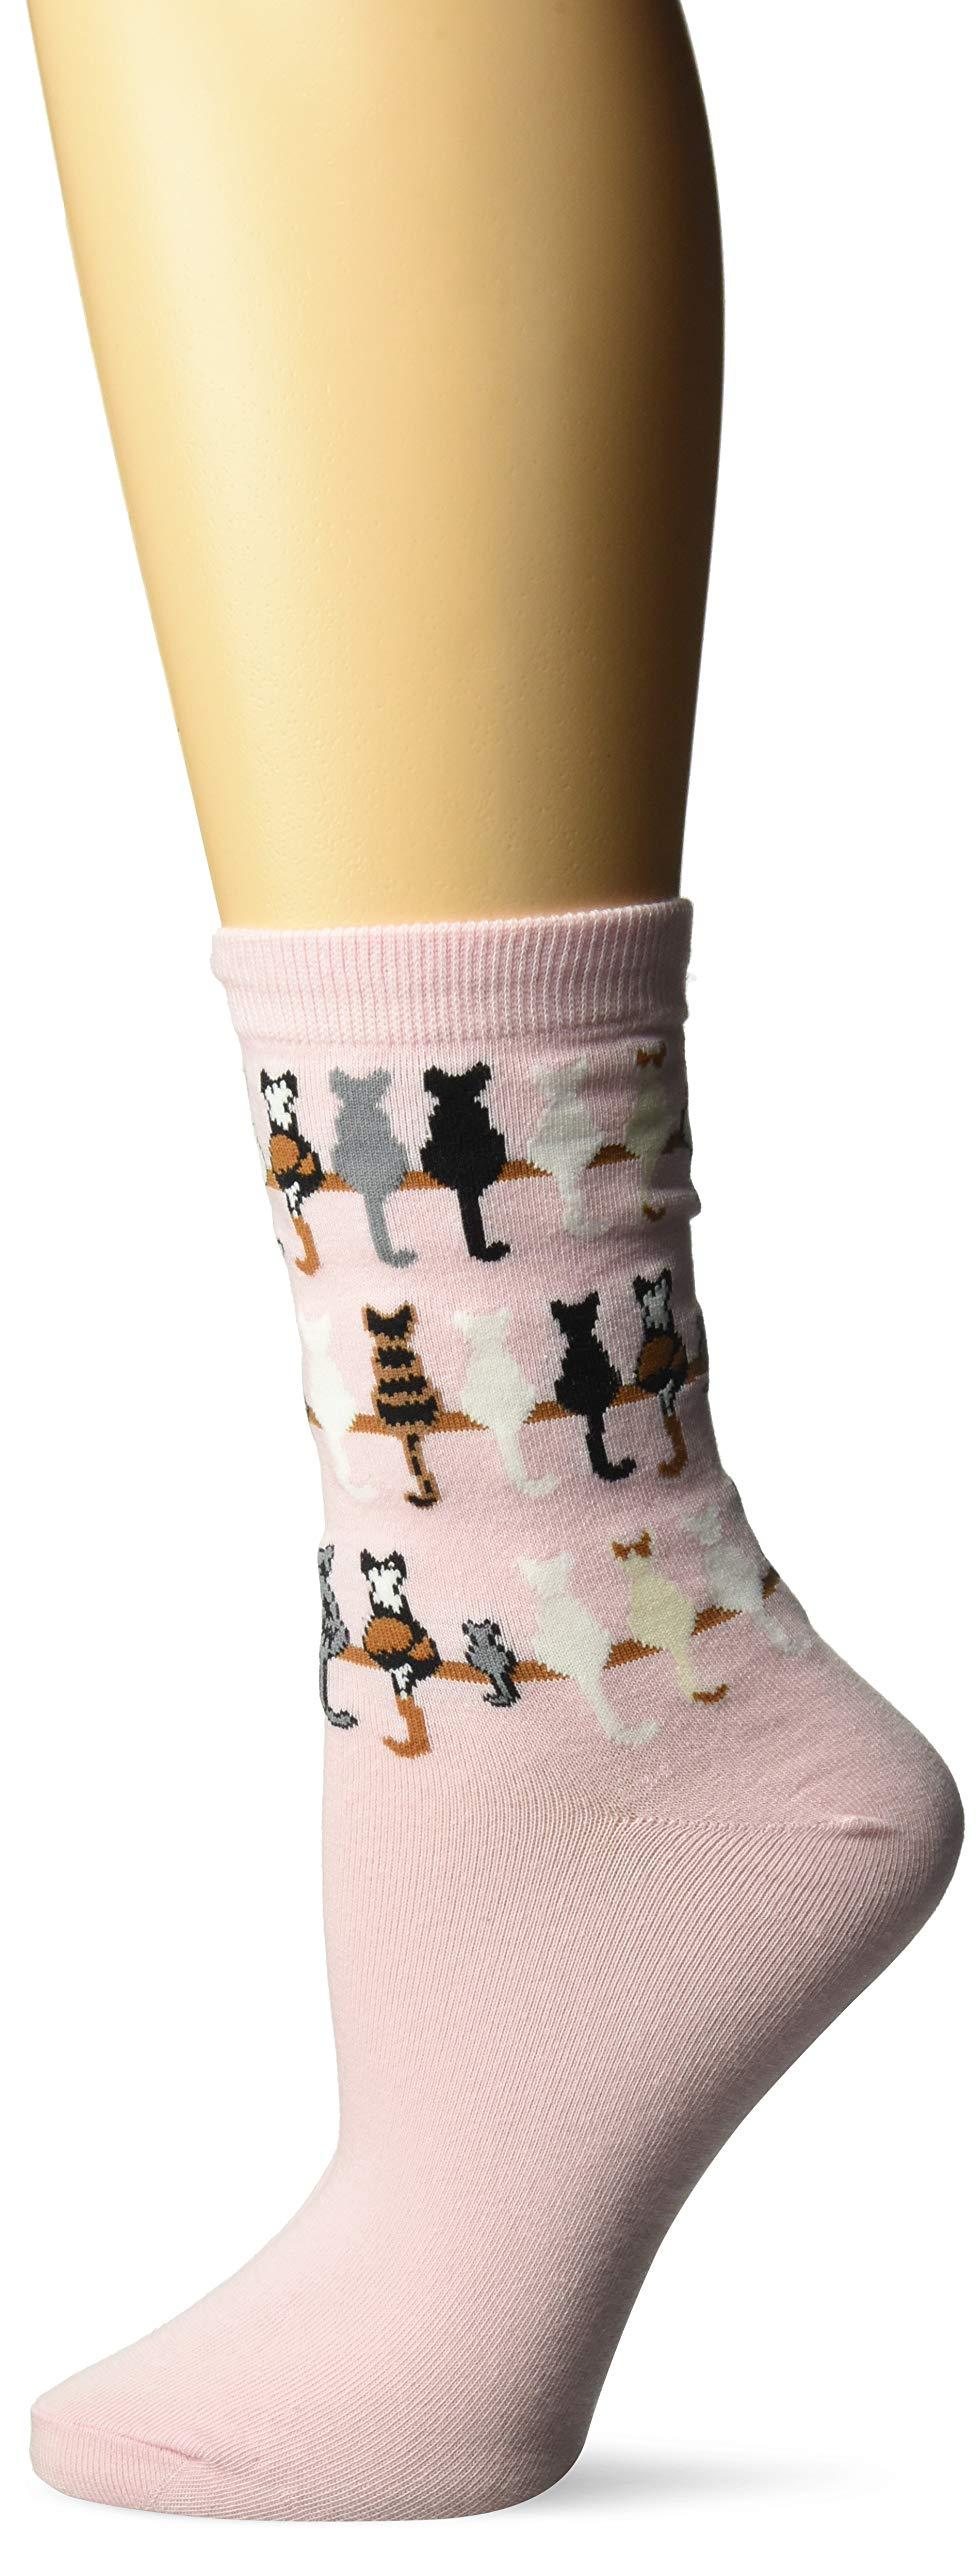 K. Bell Socks Women's Cool Cats Fun Novelty Casual Crew Socks